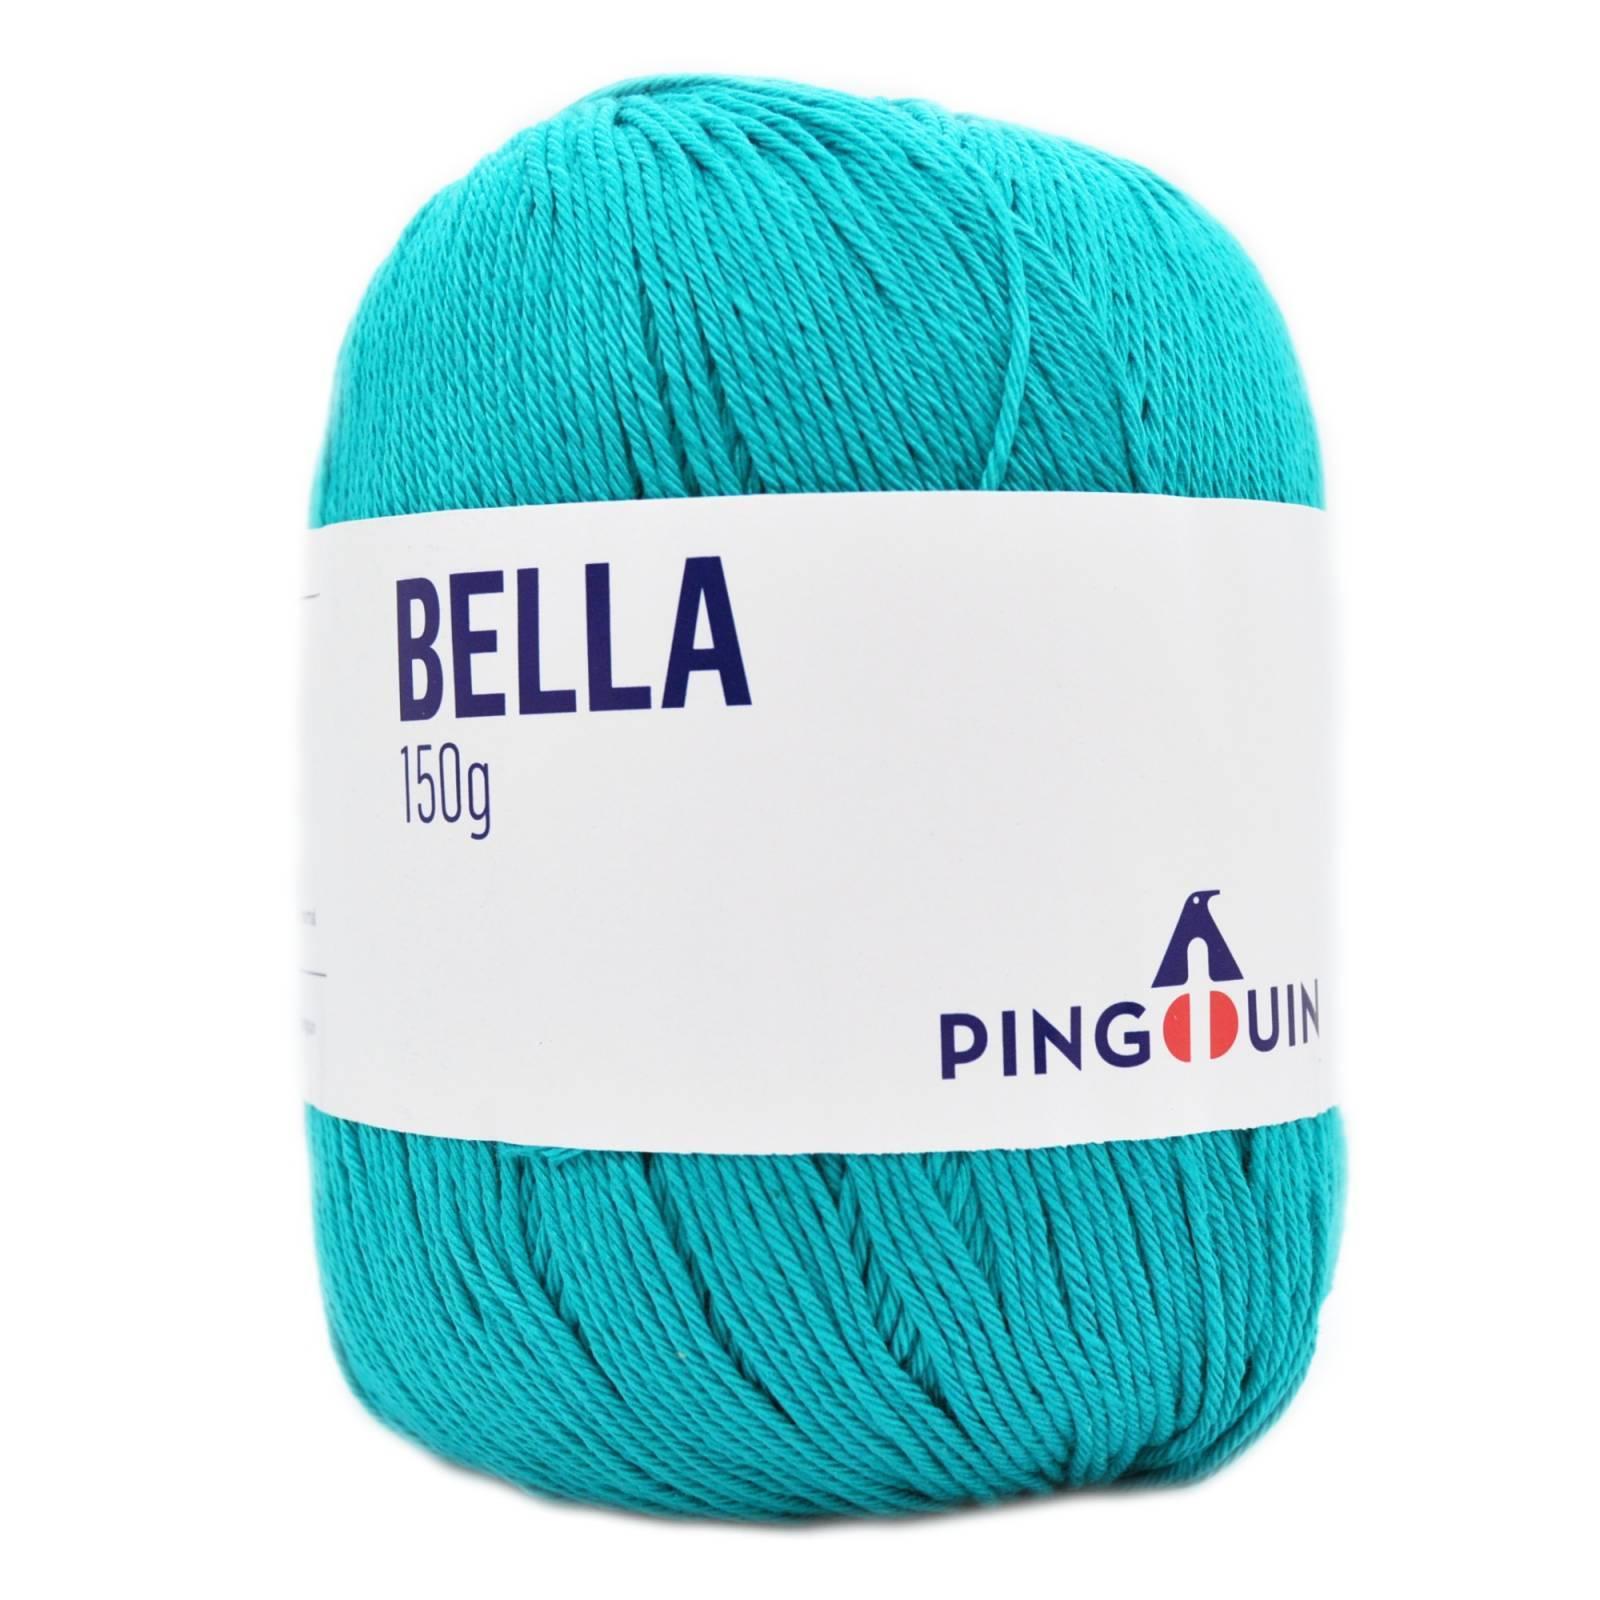 Fio Bella 2599 fonte - BAÚ DA VOVÓ